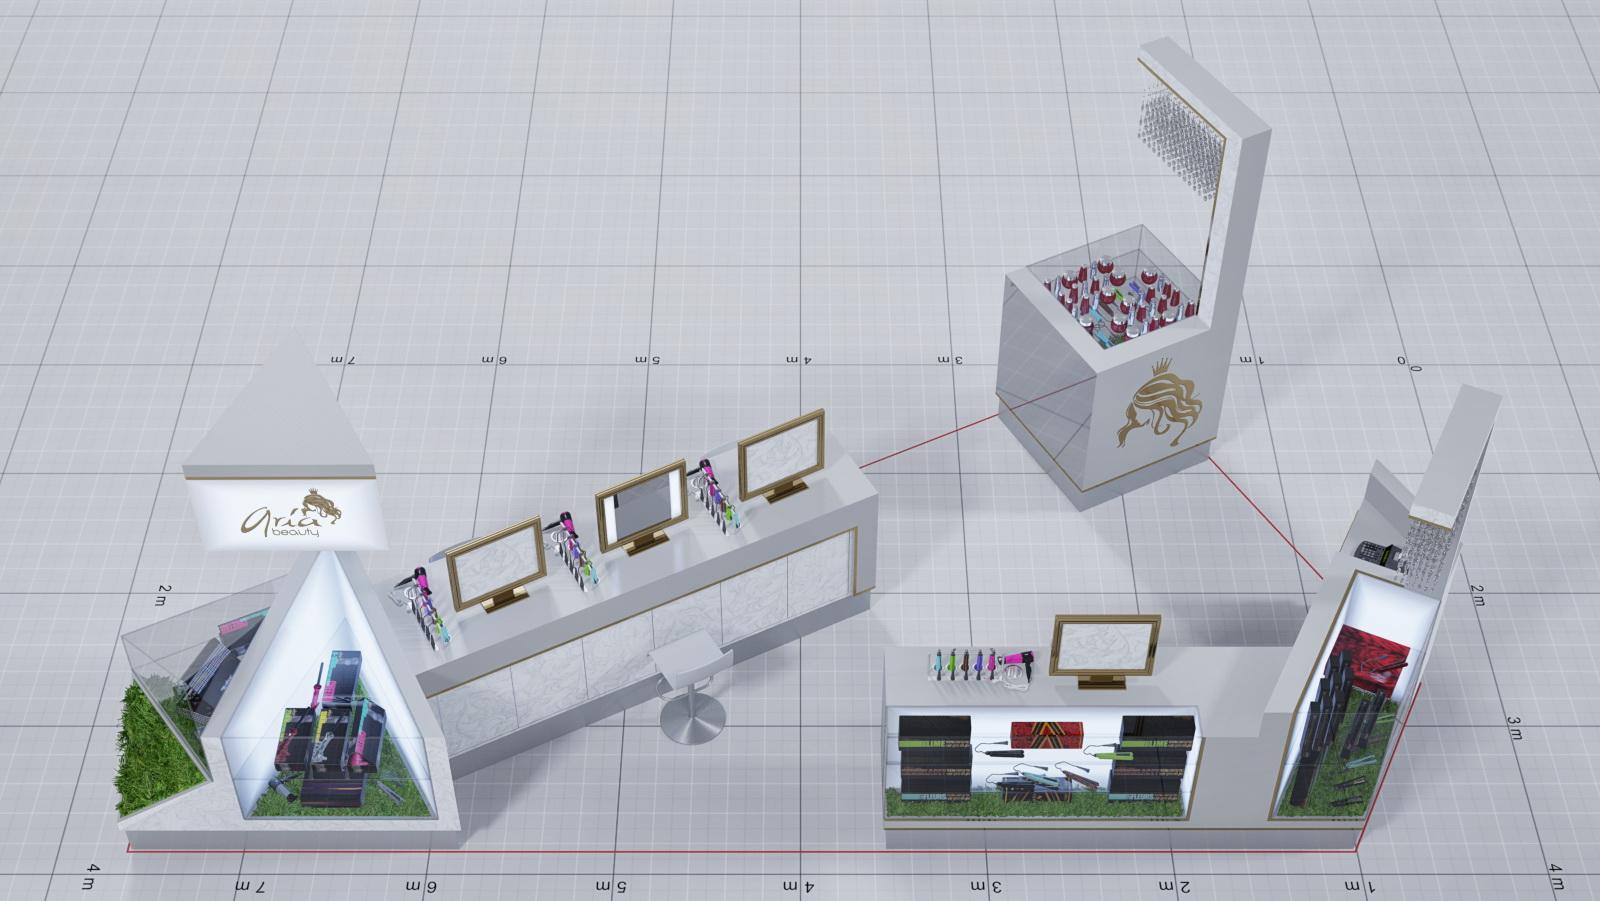 aria beauty mall kiosk 3D drawing